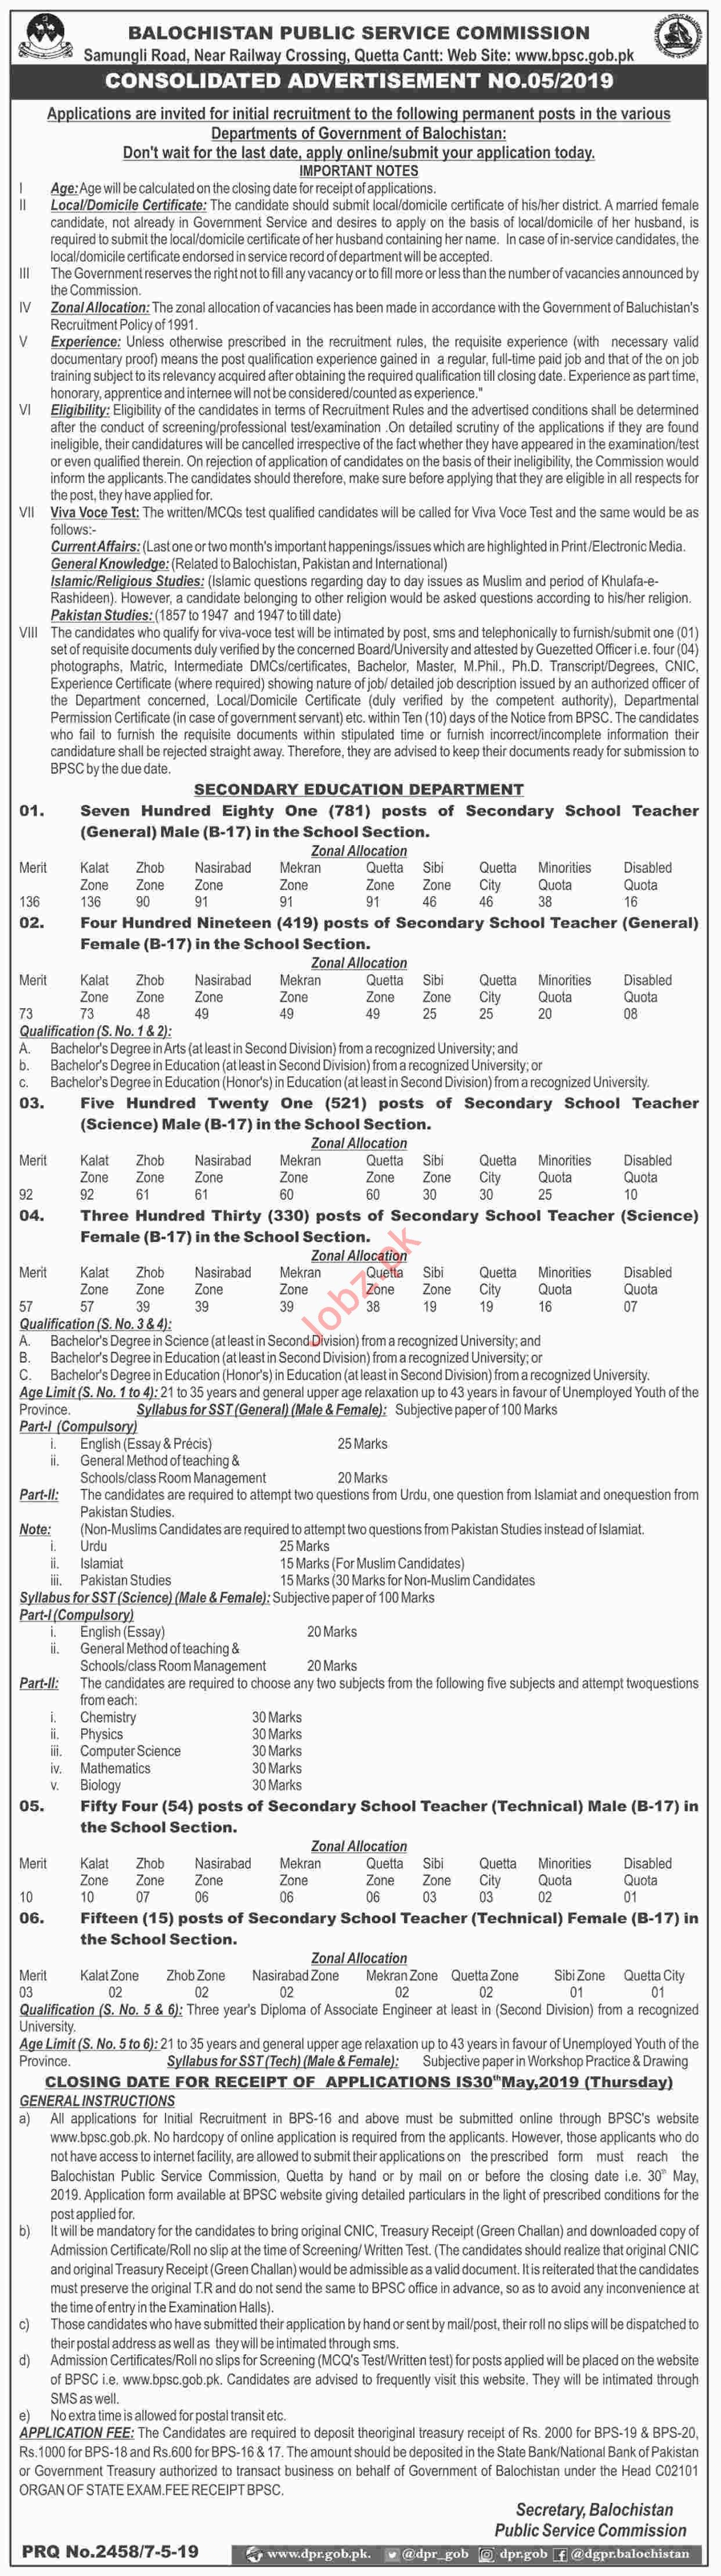 BPSC Secondary School Teachers Jobs 2019